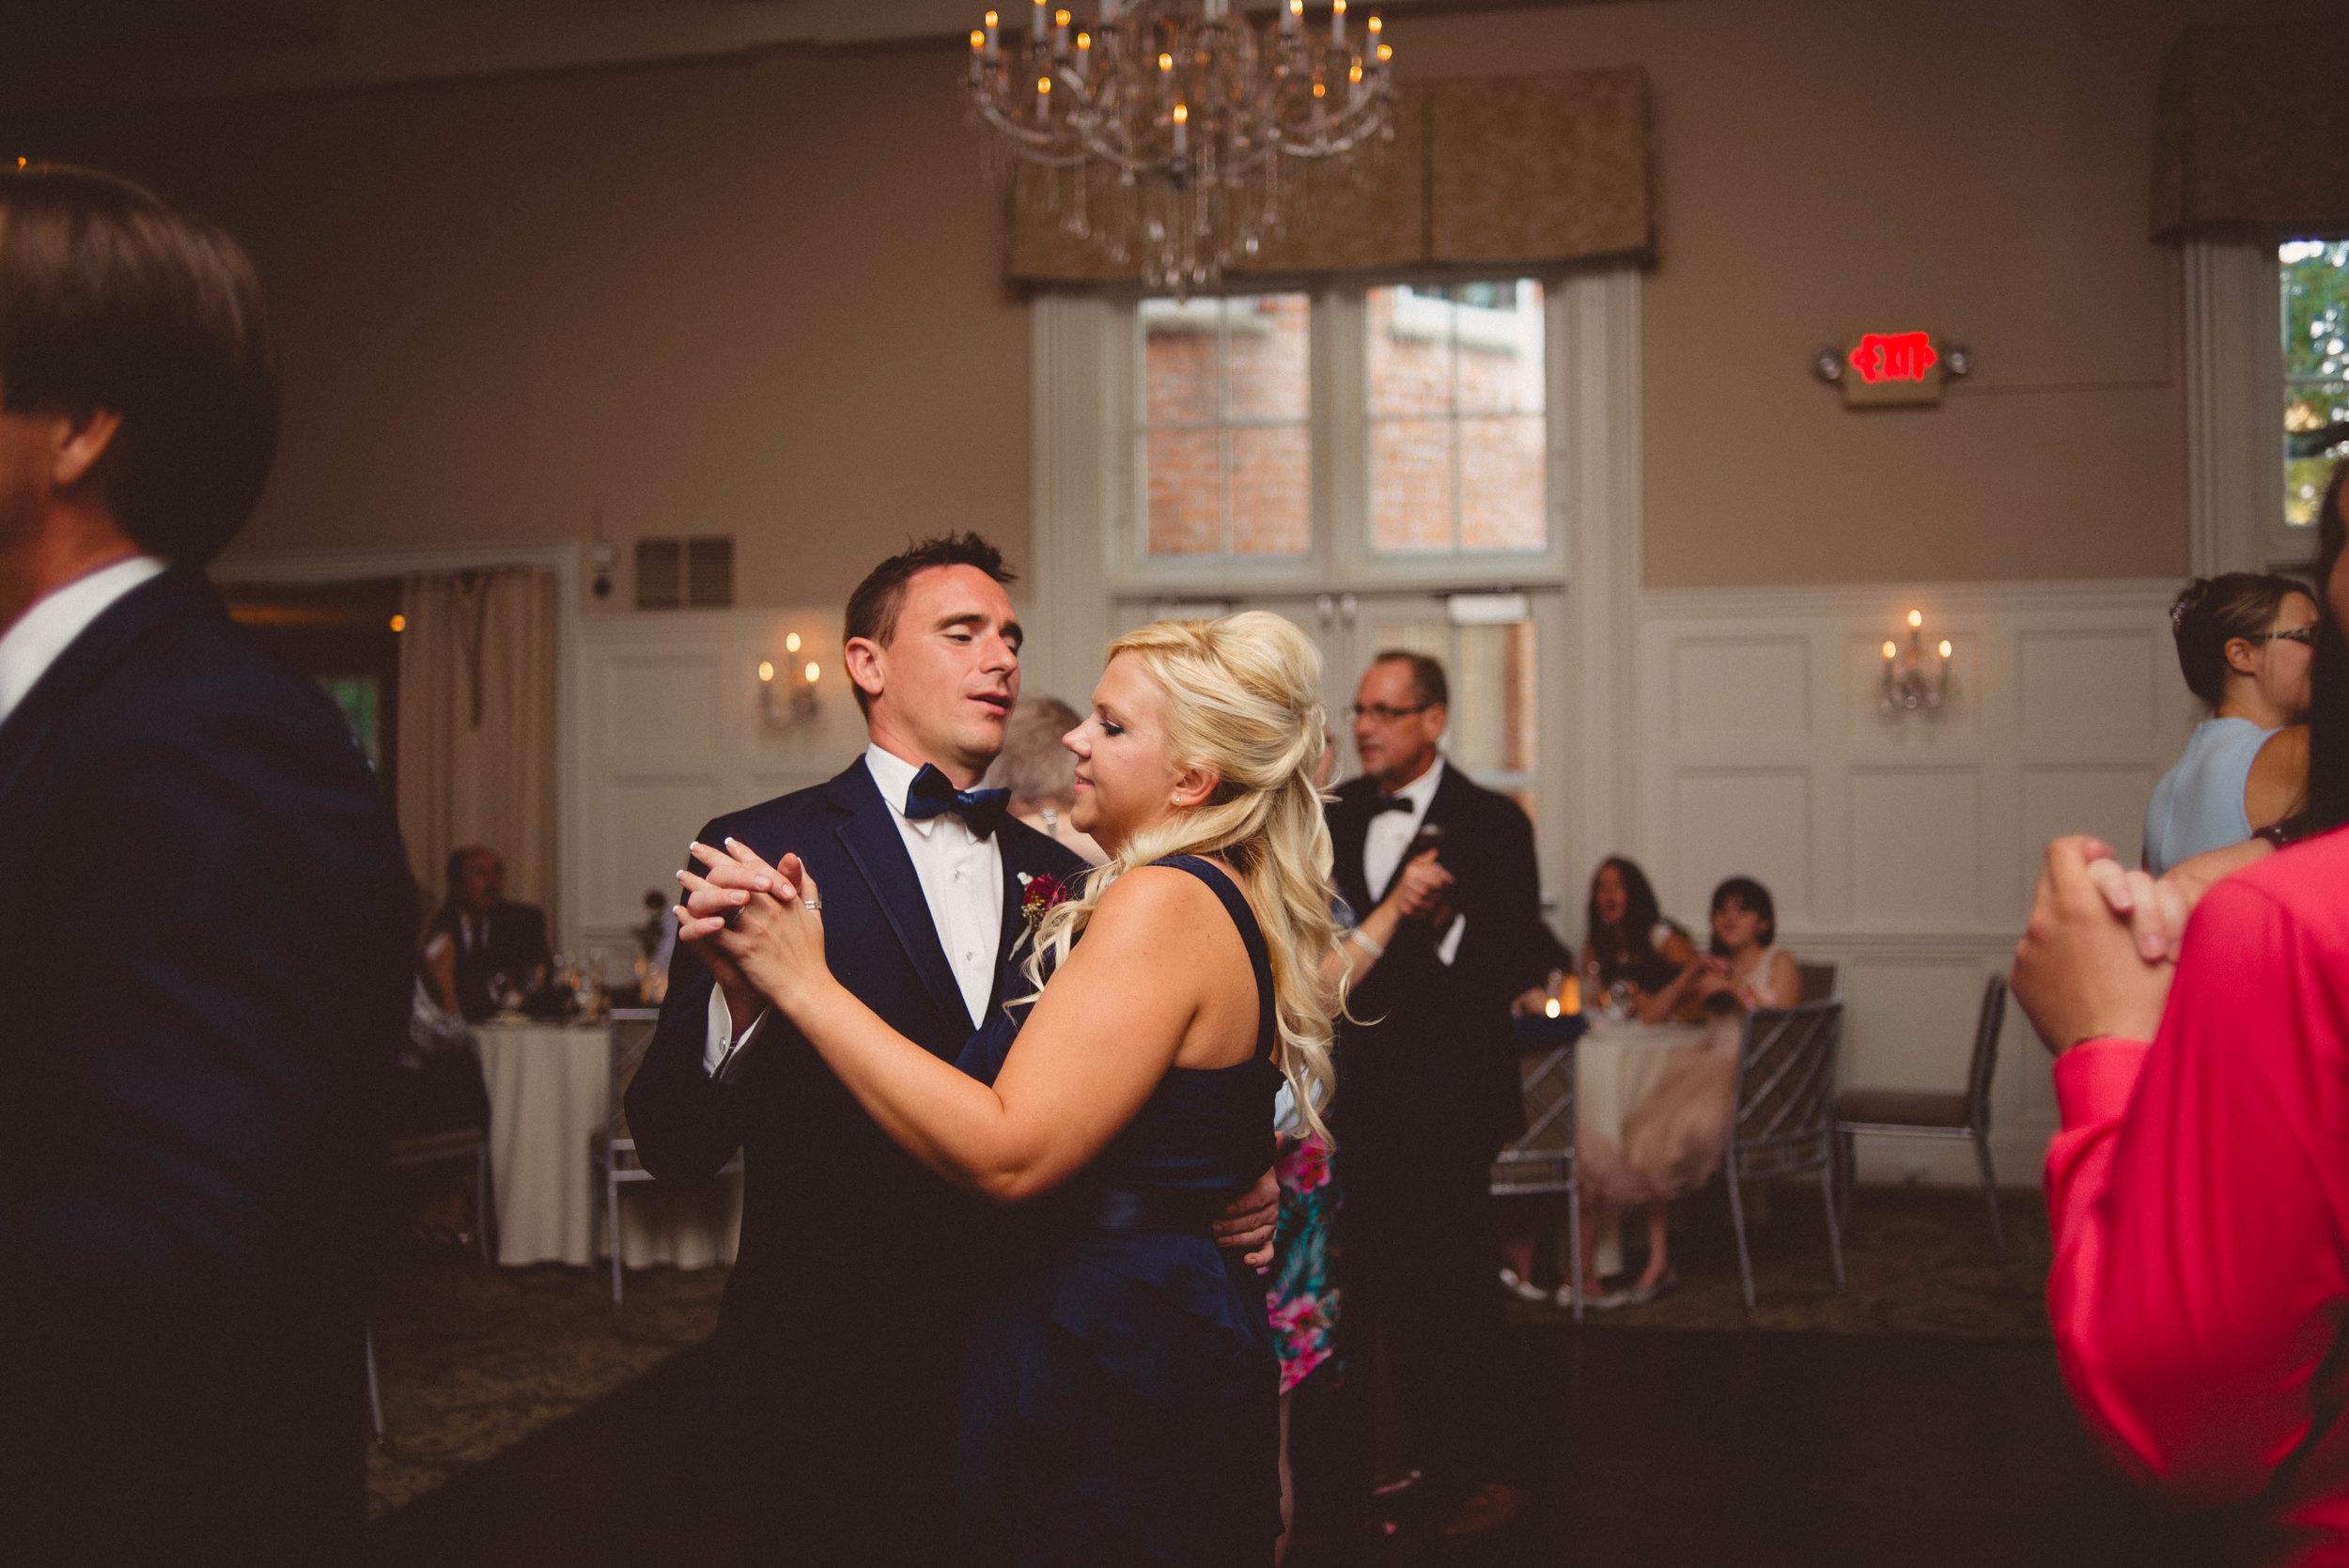 Kara and Mike Wedding-20160904-19-31-36.jpg